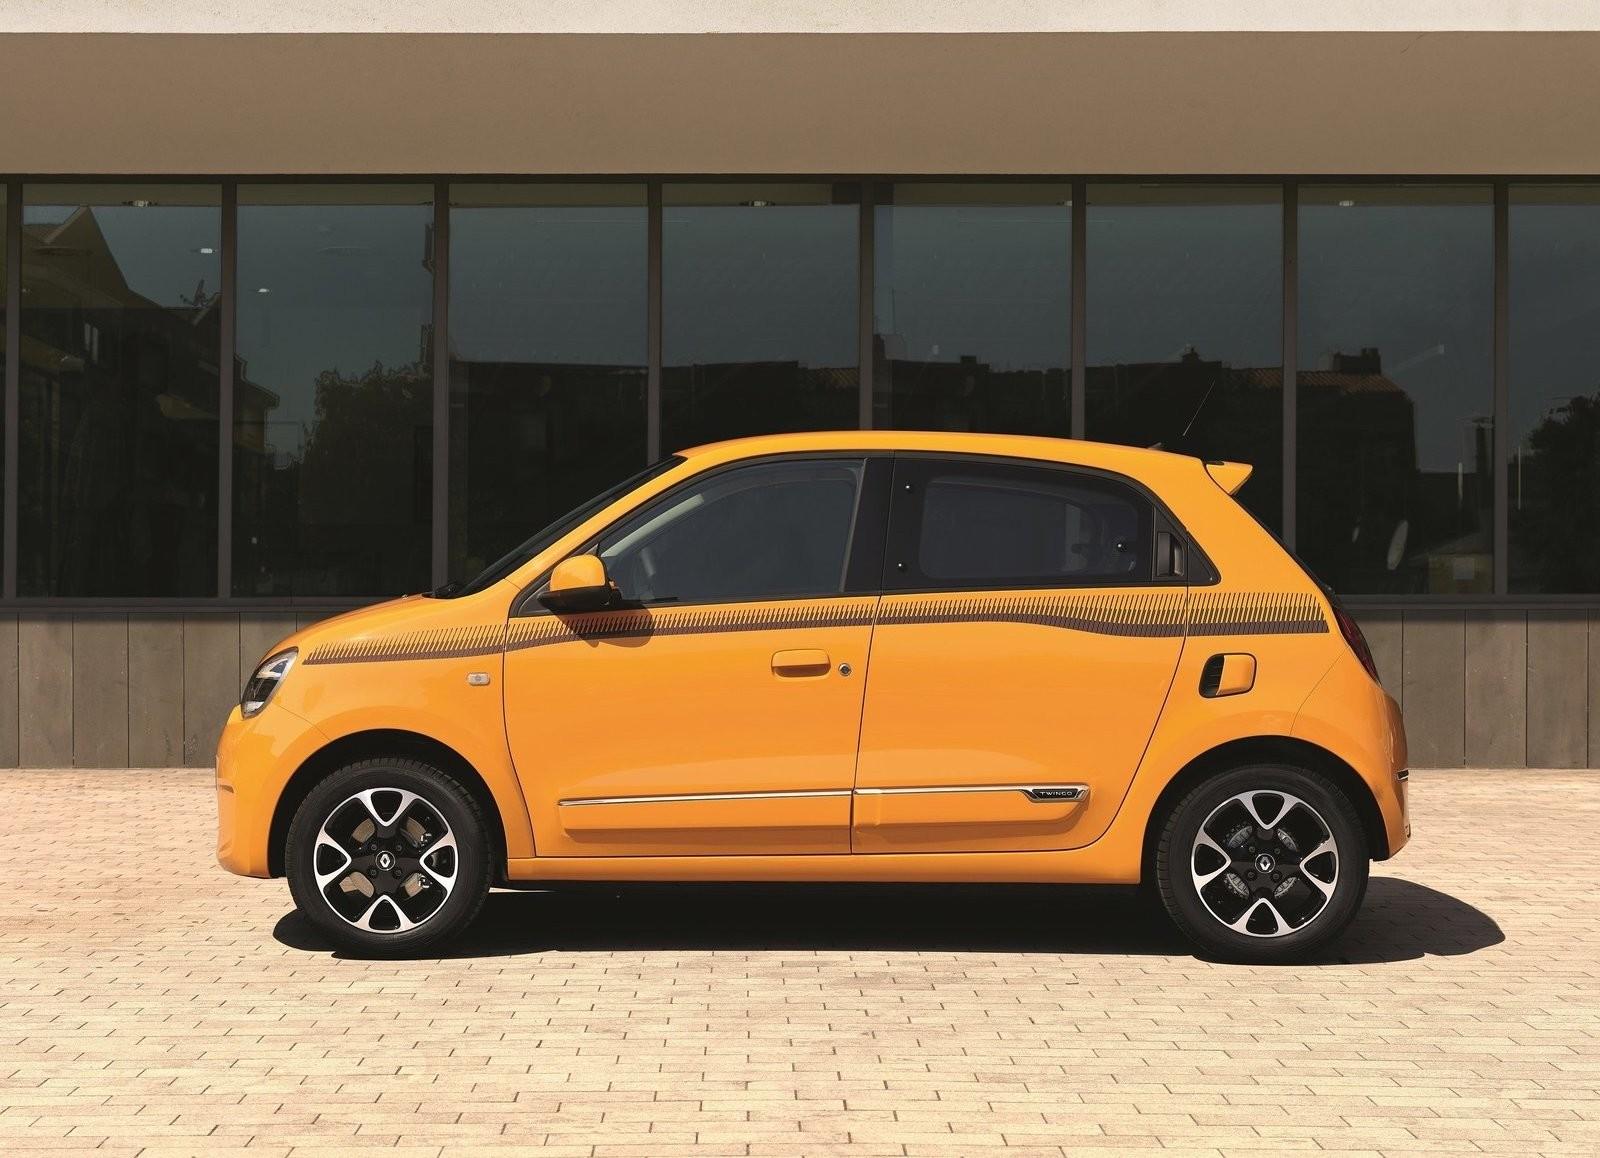 Foto de Renault Twingo 2020 (4/20)